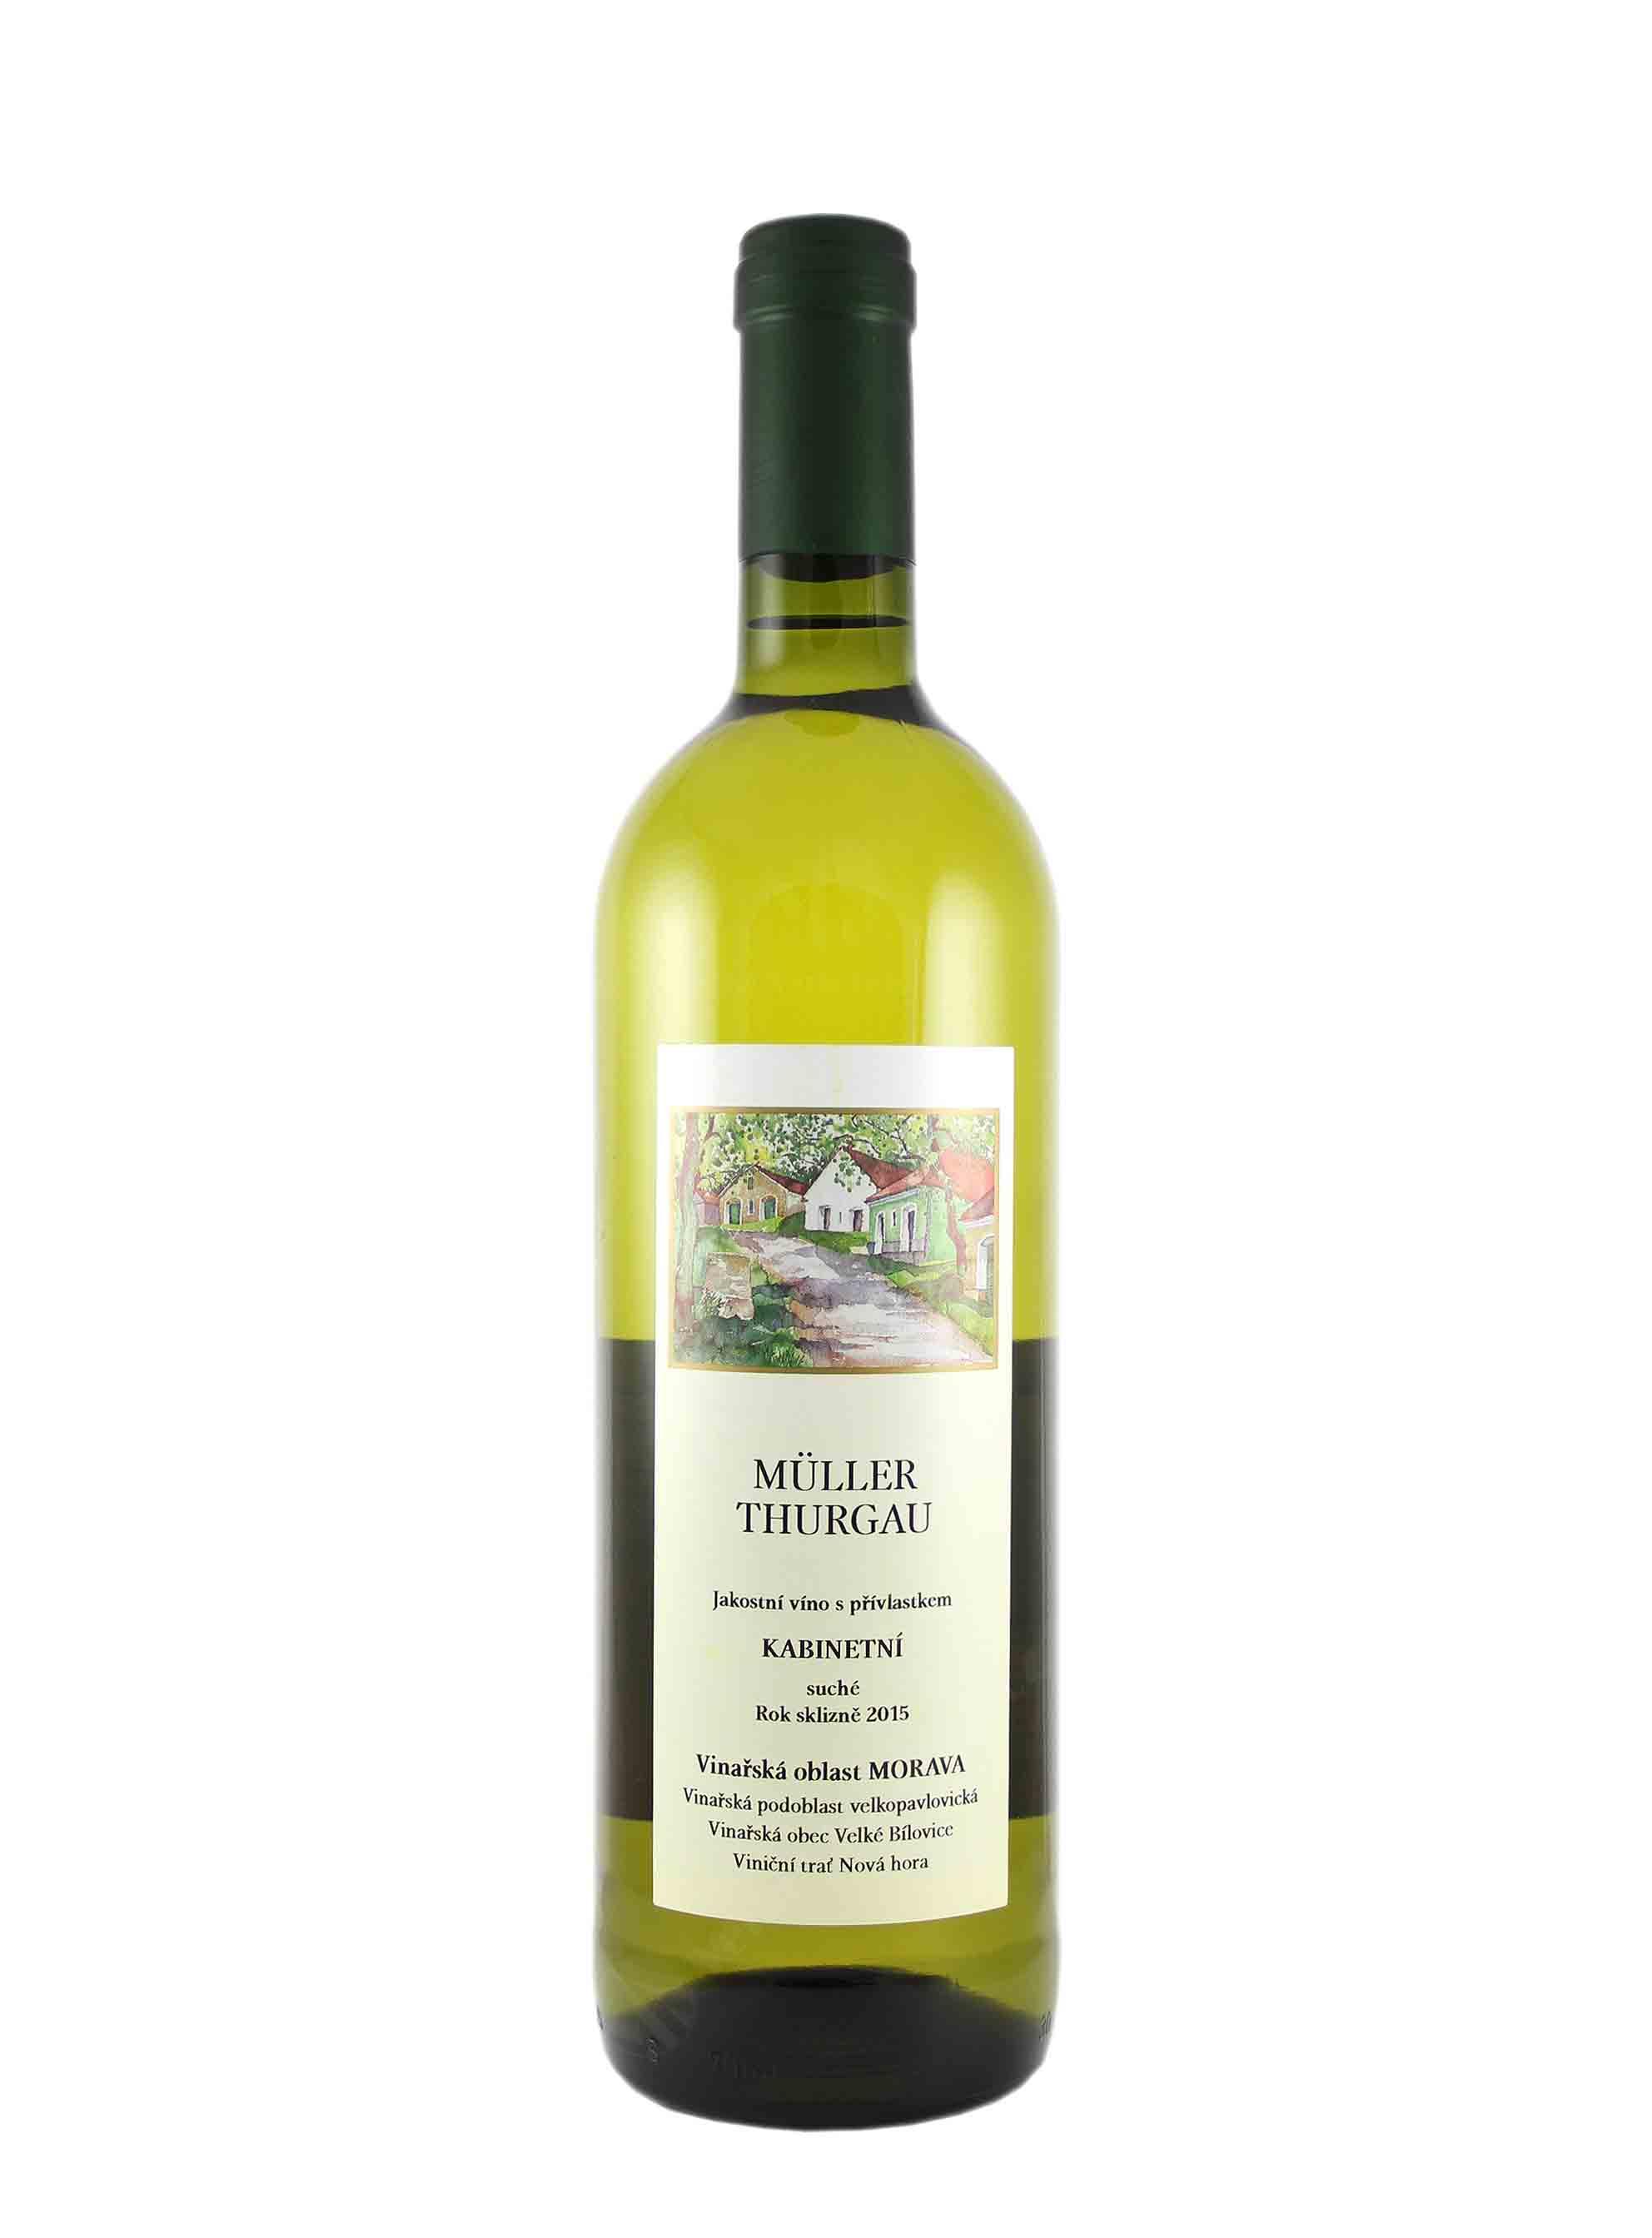 Müller Thurgau, Kabinet, 2015, František Mádl - Malý vinař, 0.75 l